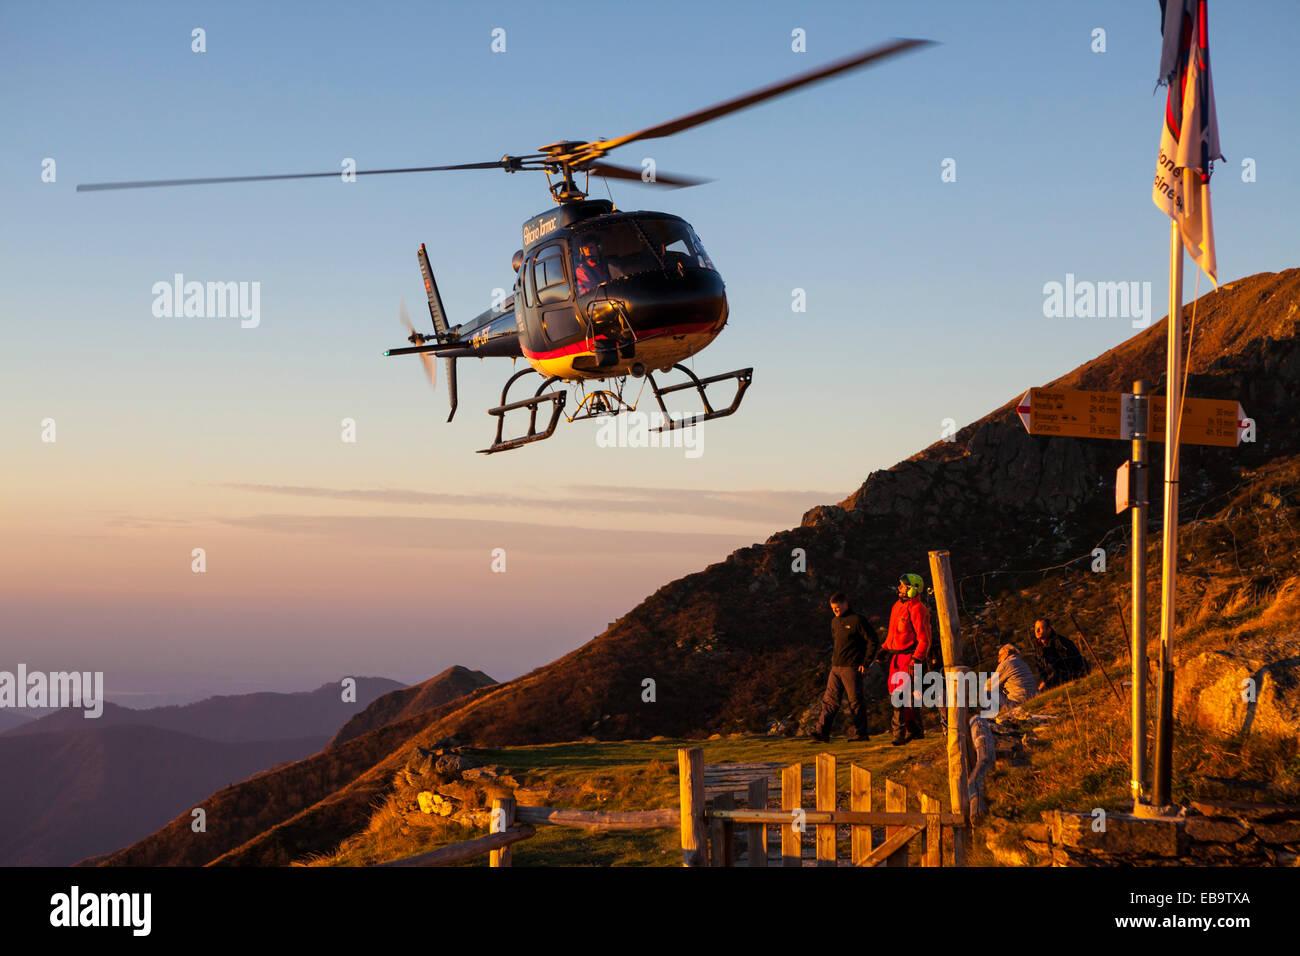 A Helicopter at Rifugio Al Legn, near Brissago, Kanton Tessin, Switzerland - Stock Image